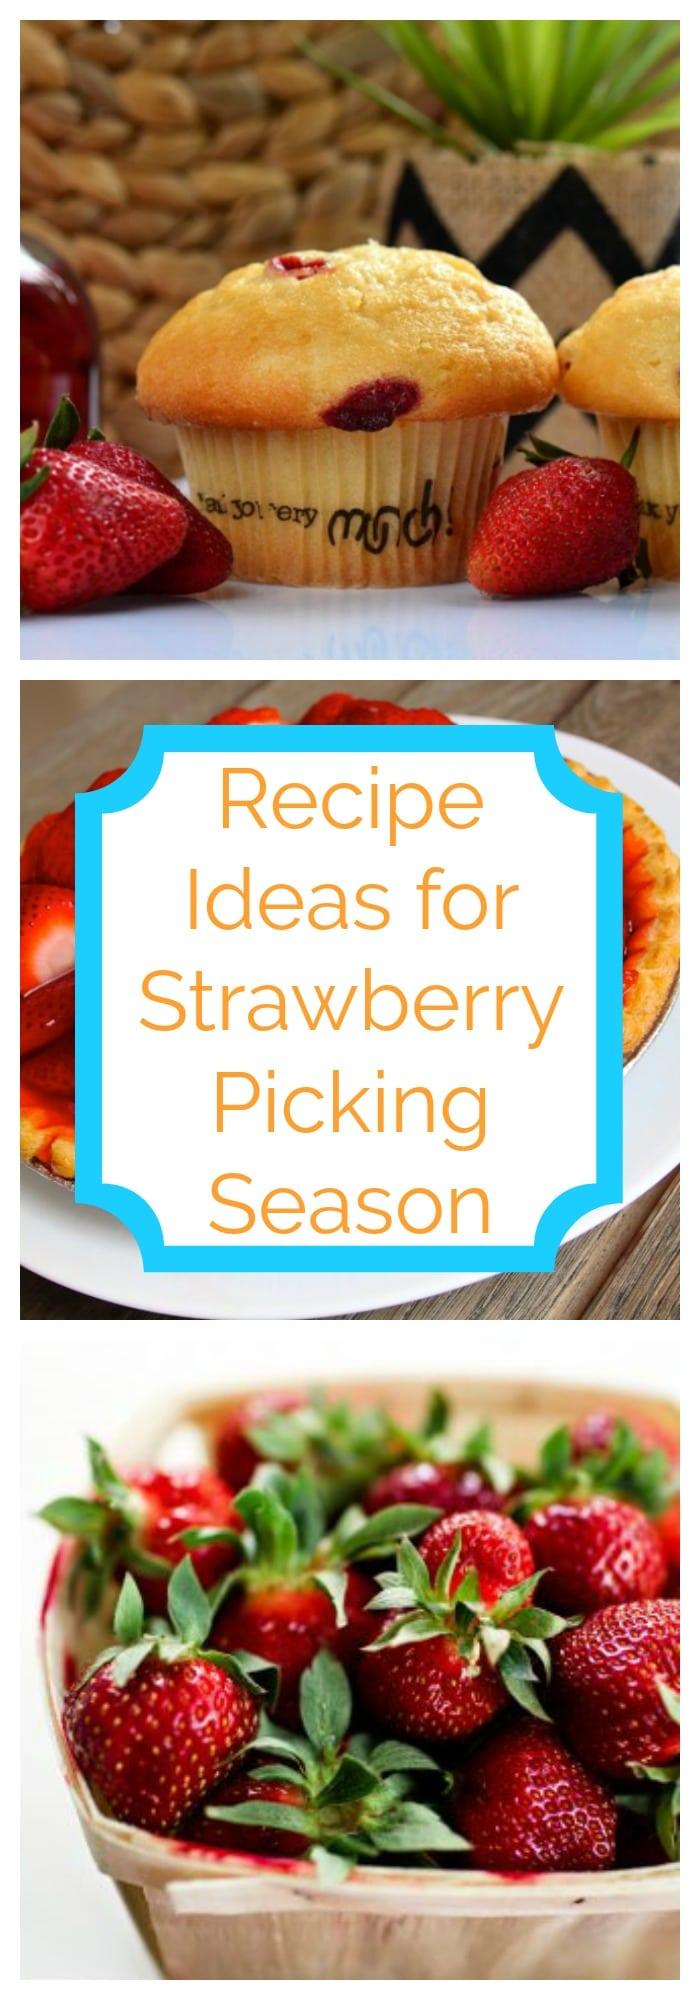 Recipe Ideas for Strawberry Picking Season